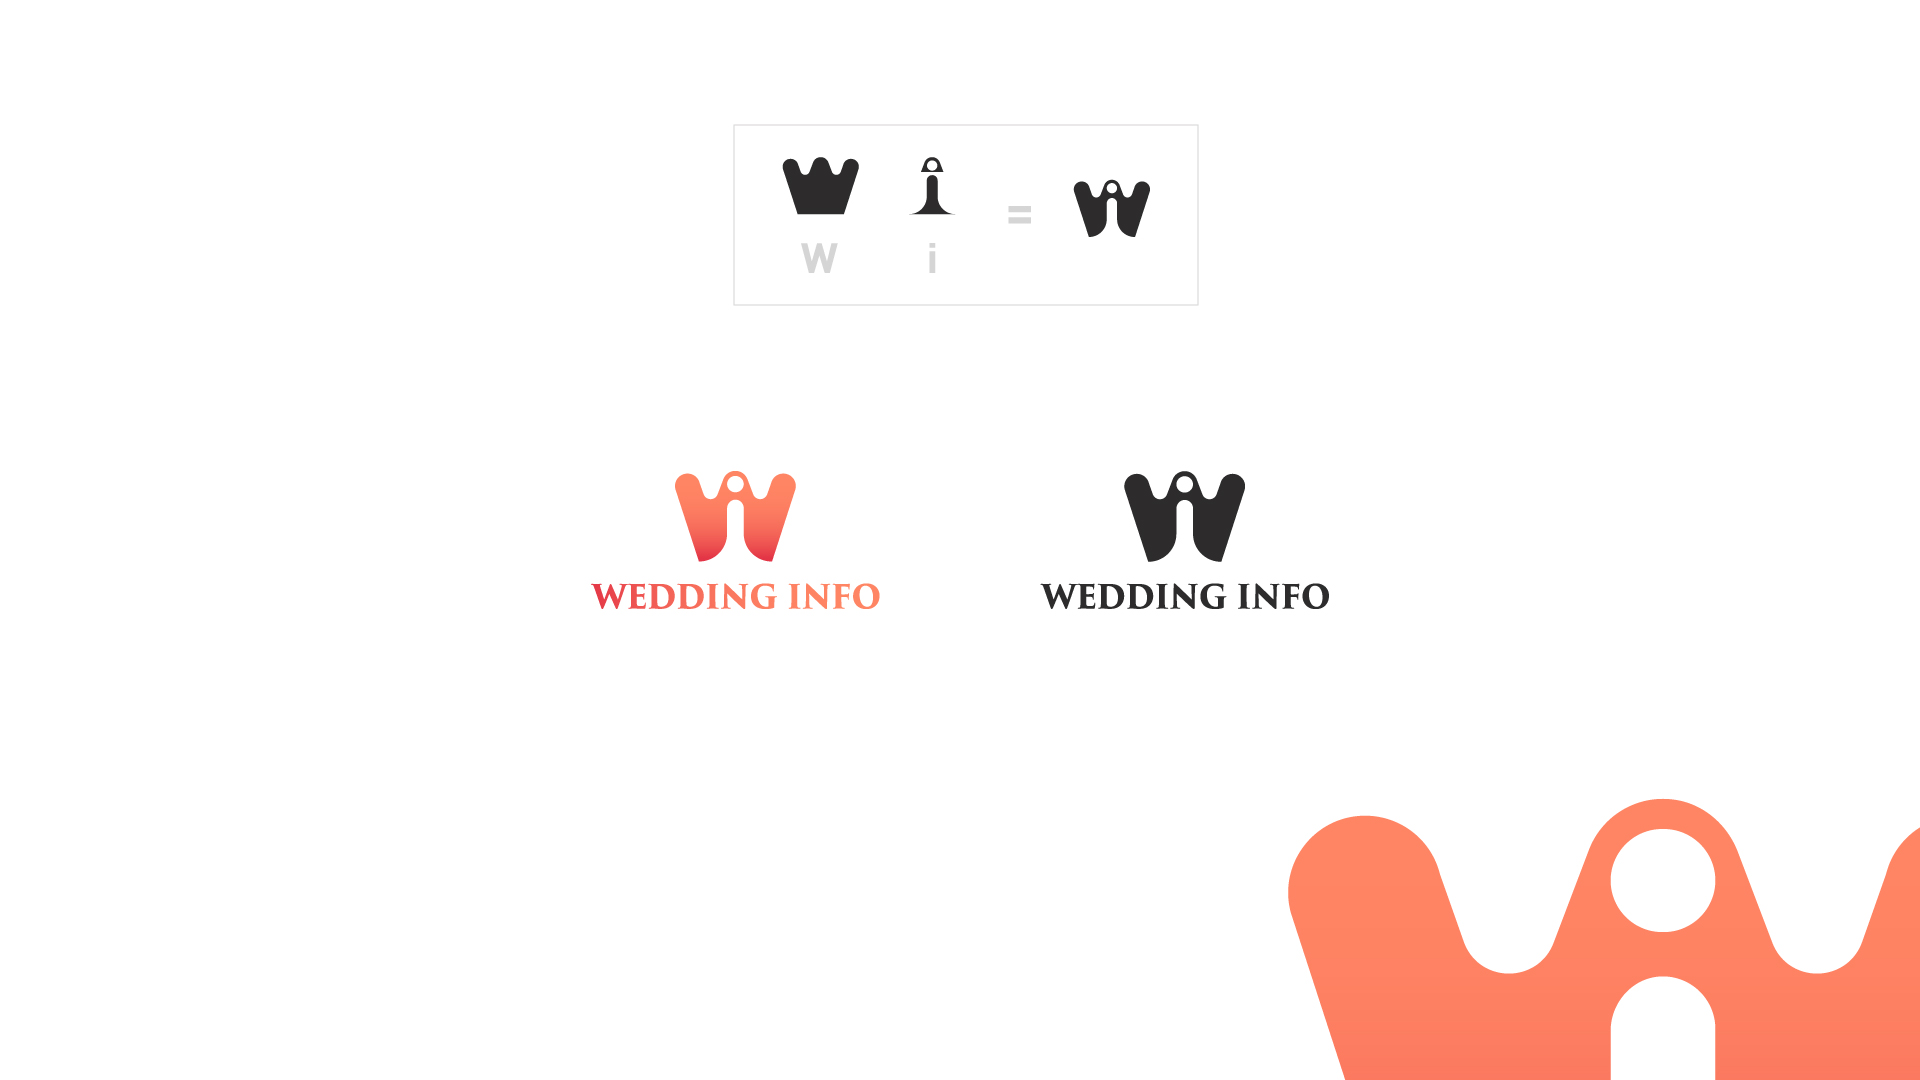 Weddinginfo logo design, ლოგოს დამზადება, ლოგოს დიზაინი, ლოგოების შექმნა, ლოგოების დამზადება, ლოგოს დამზადების ფასი, ბრენდინგი, ბანერების დამზადება, ლოგოტიპის შექმნა, ლოგოტიპების დიზაინი, ოპტიმიზაცია, facebook დიზაინი, ვებგვერდის დიზაინი, ლოგოების დიზაინი, ლოგოტიპების დამზადება, saitebis damzadena, logoebis damzadena, saitis damzadeba, logos damzadeba,